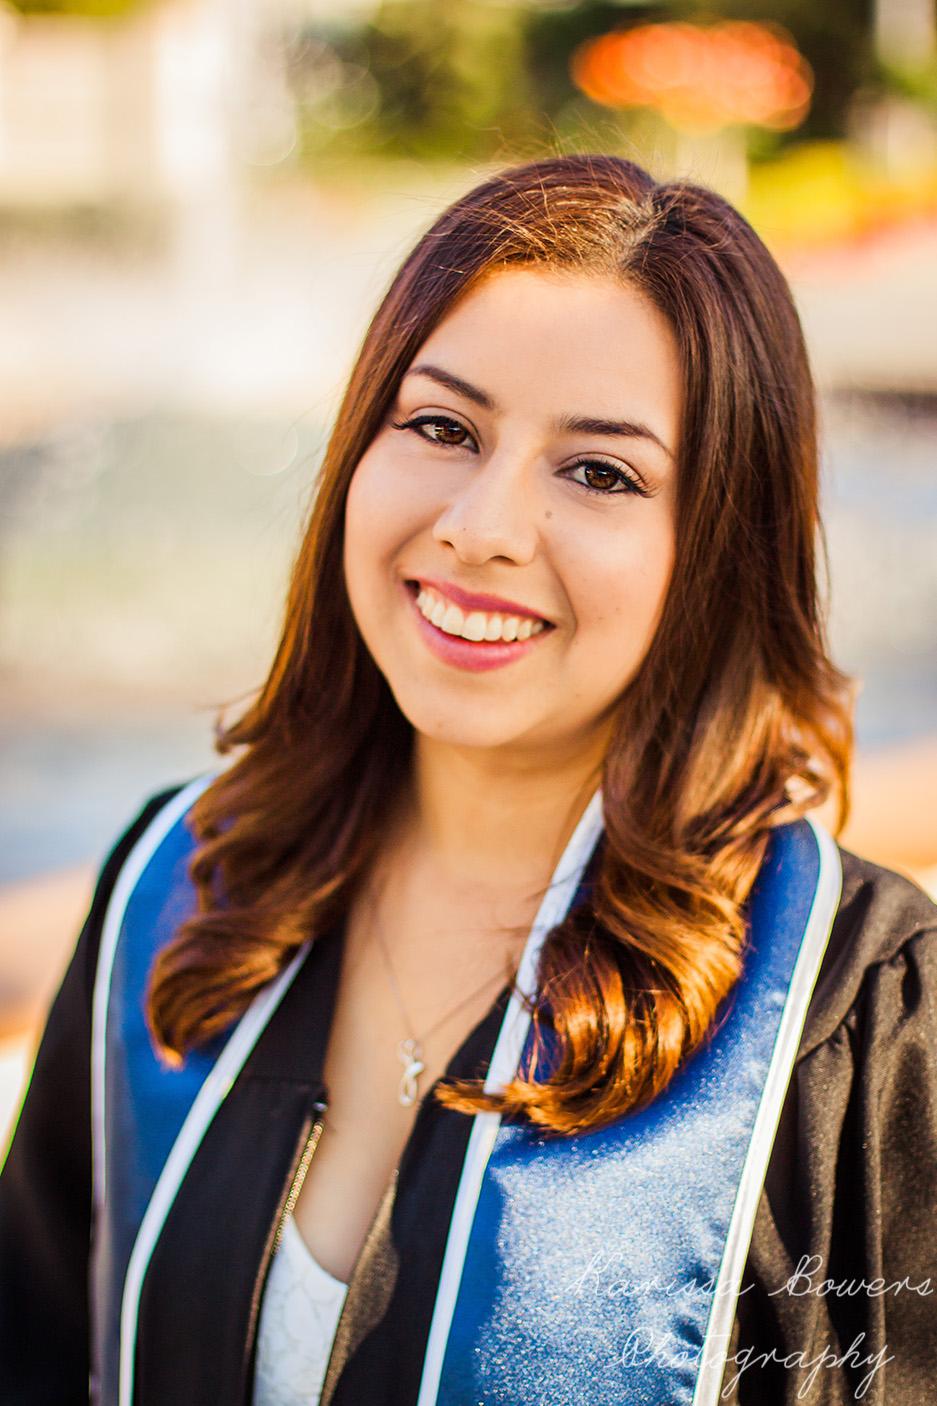 San Diego Graduation Portrait Photography | Senior Photos | Karissa Bowers Photography